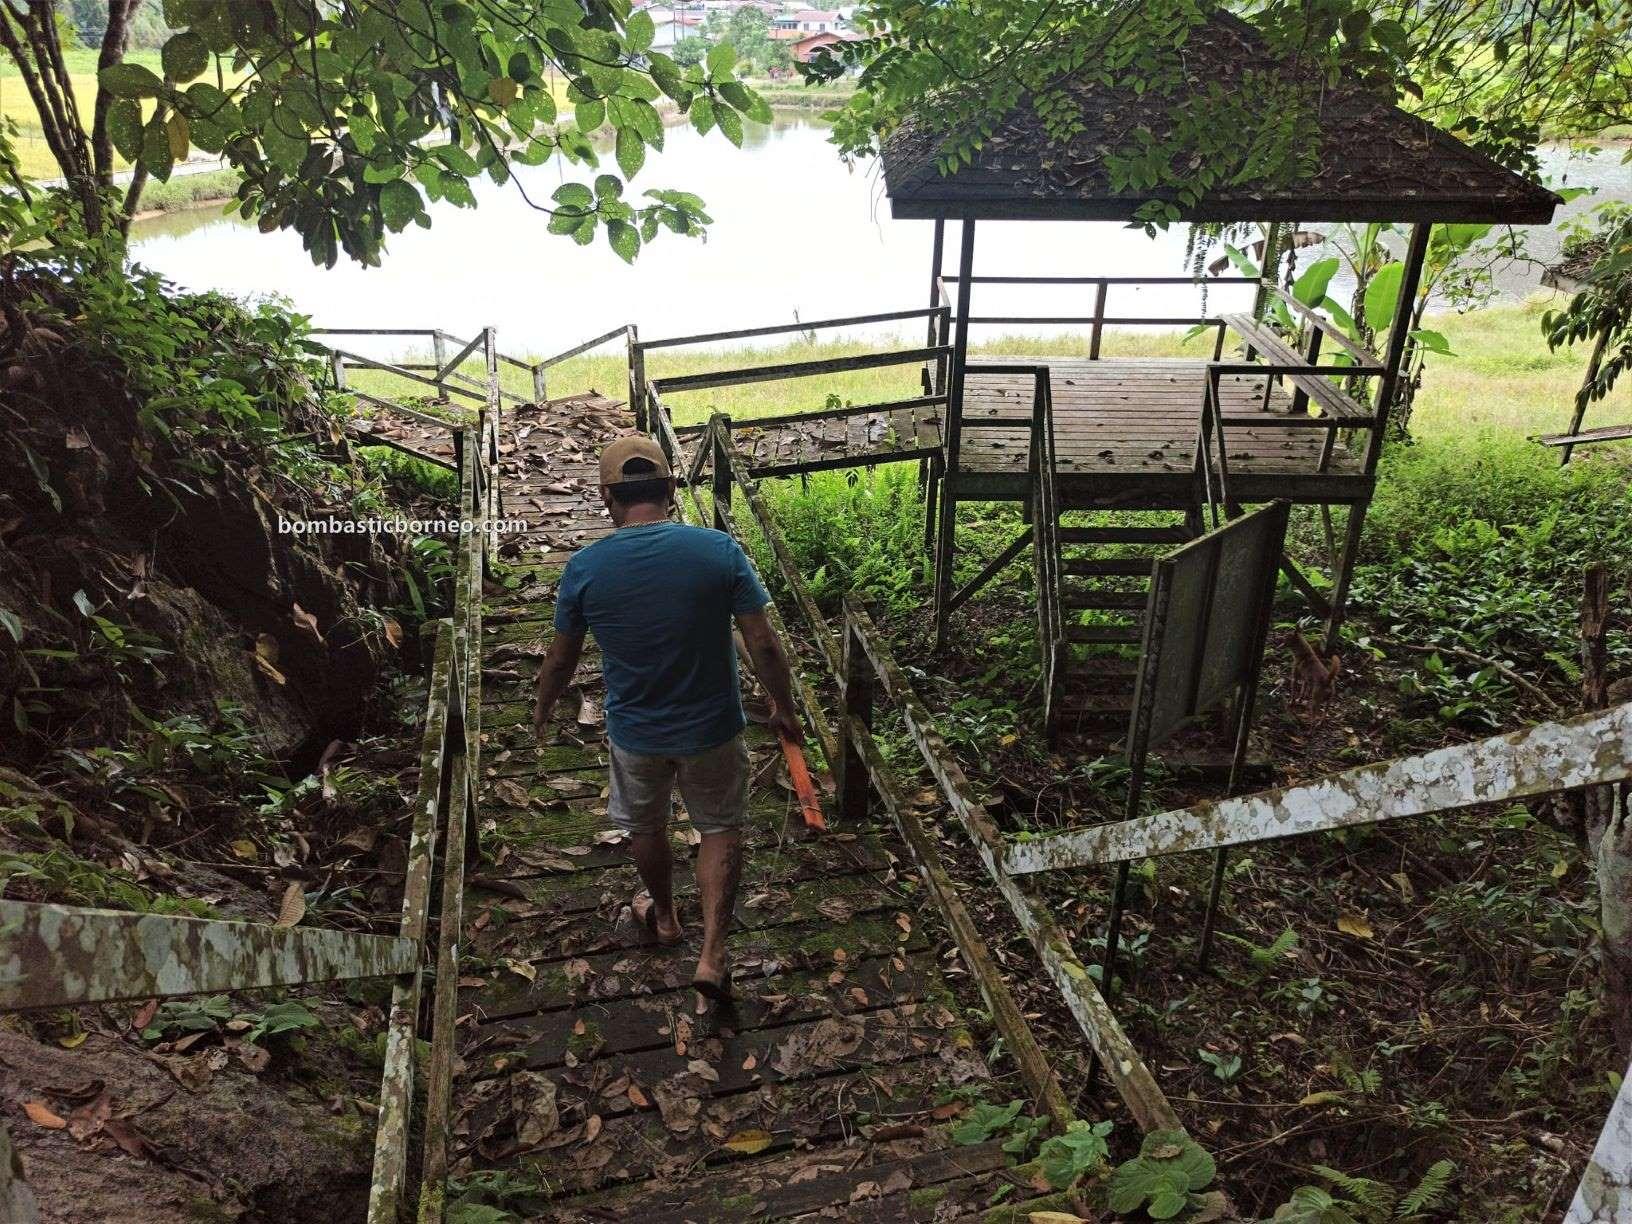 Paddy Field, Sawah Padi, Kampung Chupak, Dayak Bidayuh, Village, backpackers, destination, objek wisata, Tourism, travel guide, Gua Raya, Borneo, 穿越马来西亚砂拉越, 西连稻米之乡, 婆罗洲旅游景点